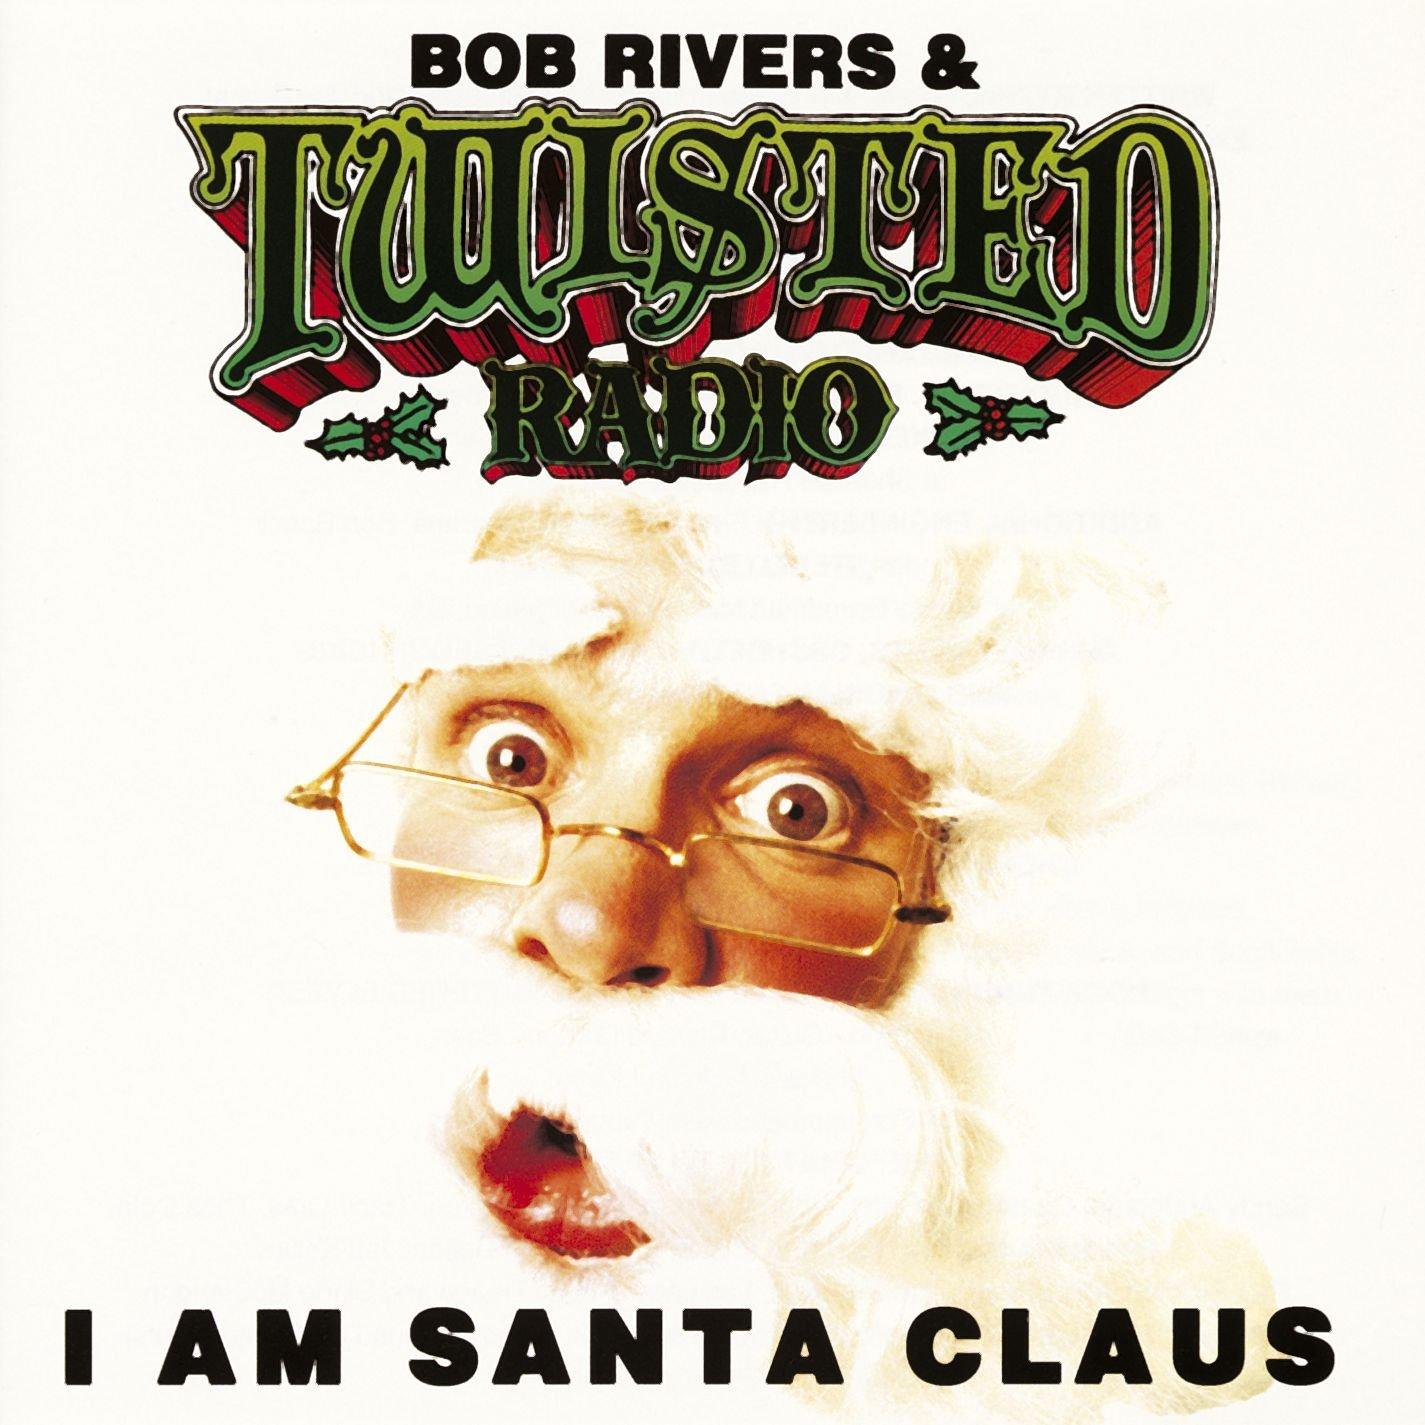 Bob Rivers and Twisted Radio - I Am Santa Claus - Amazon.com Music